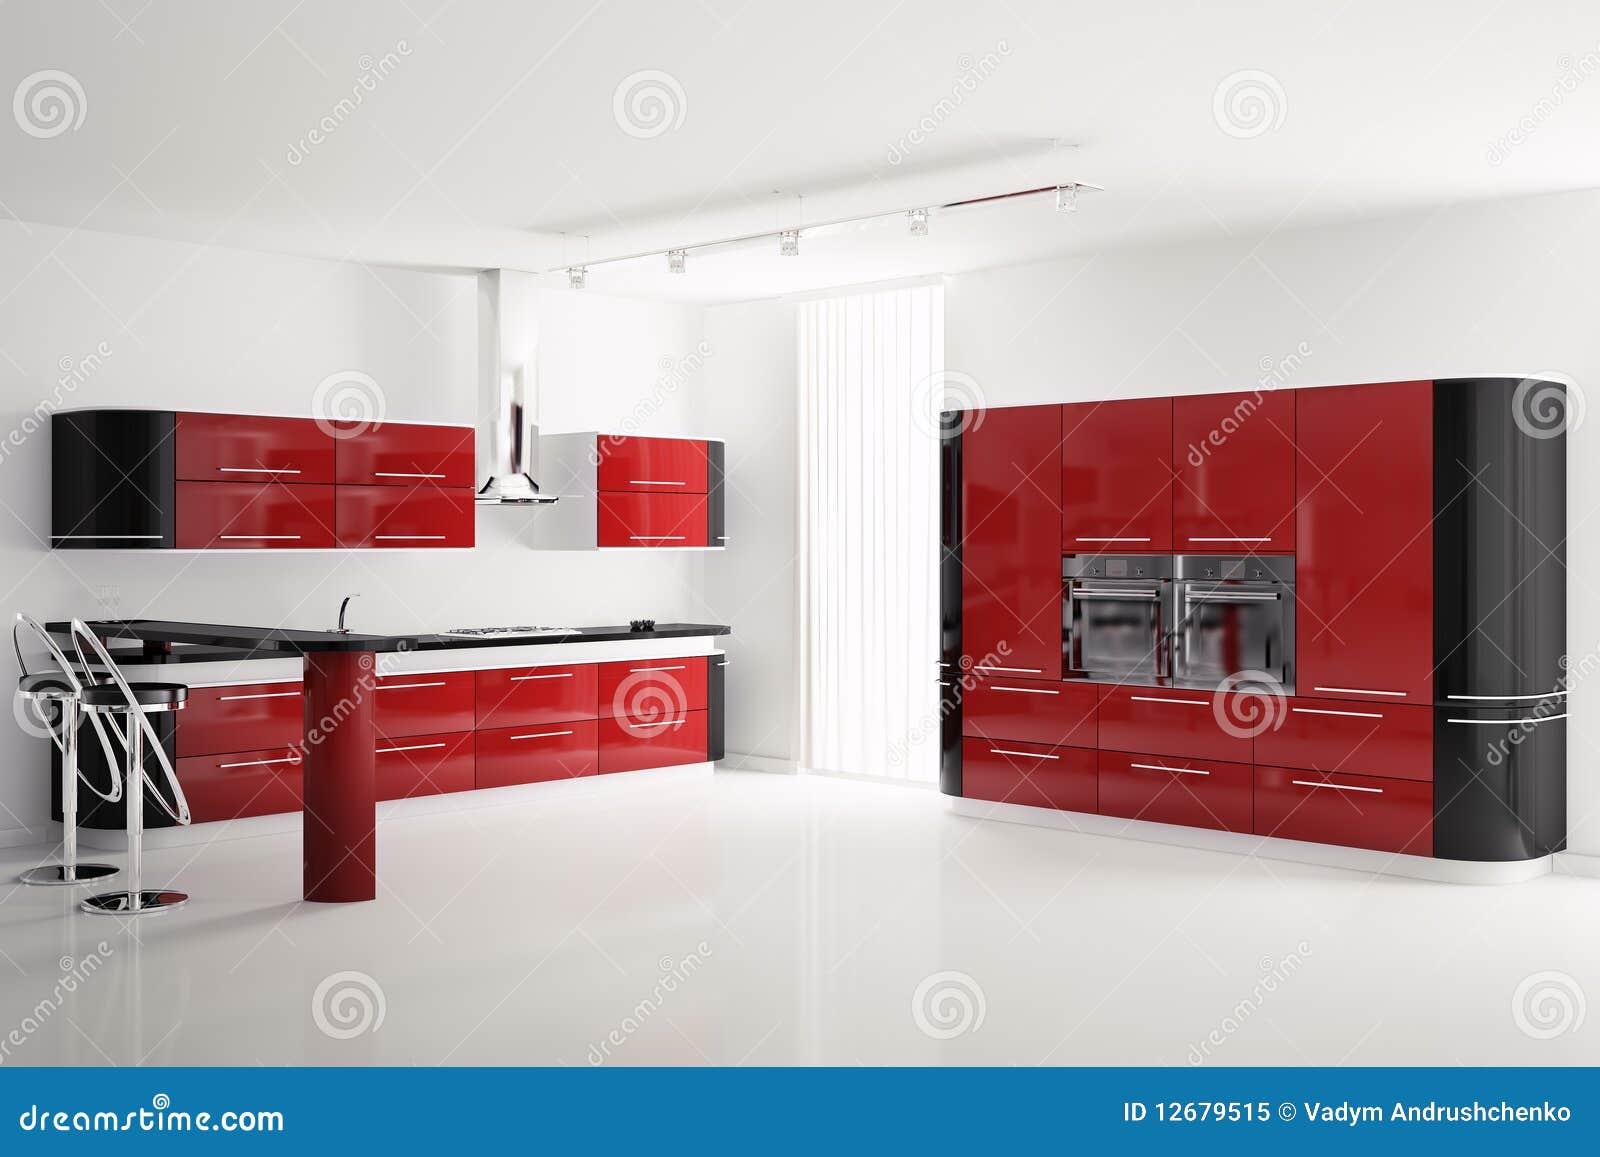 chambre a coucher moderne rouge et noir. Black Bedroom Furniture Sets. Home Design Ideas